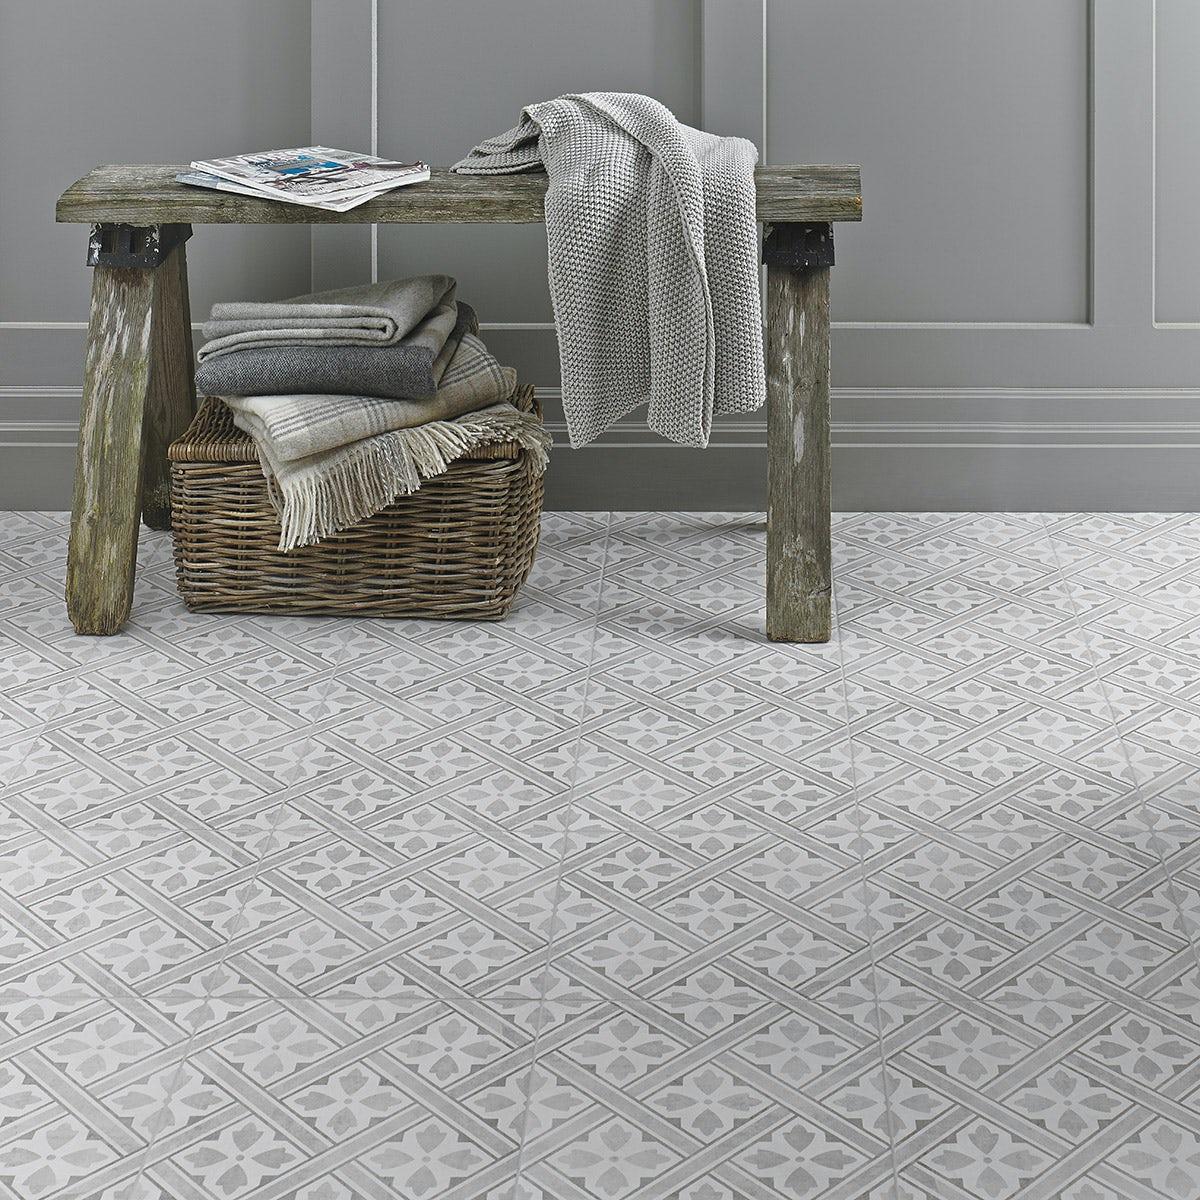 Laura ashley bathroom tiles - New Laura Ashley Mr Jones Dove Grey Tile 331mm X 331mm